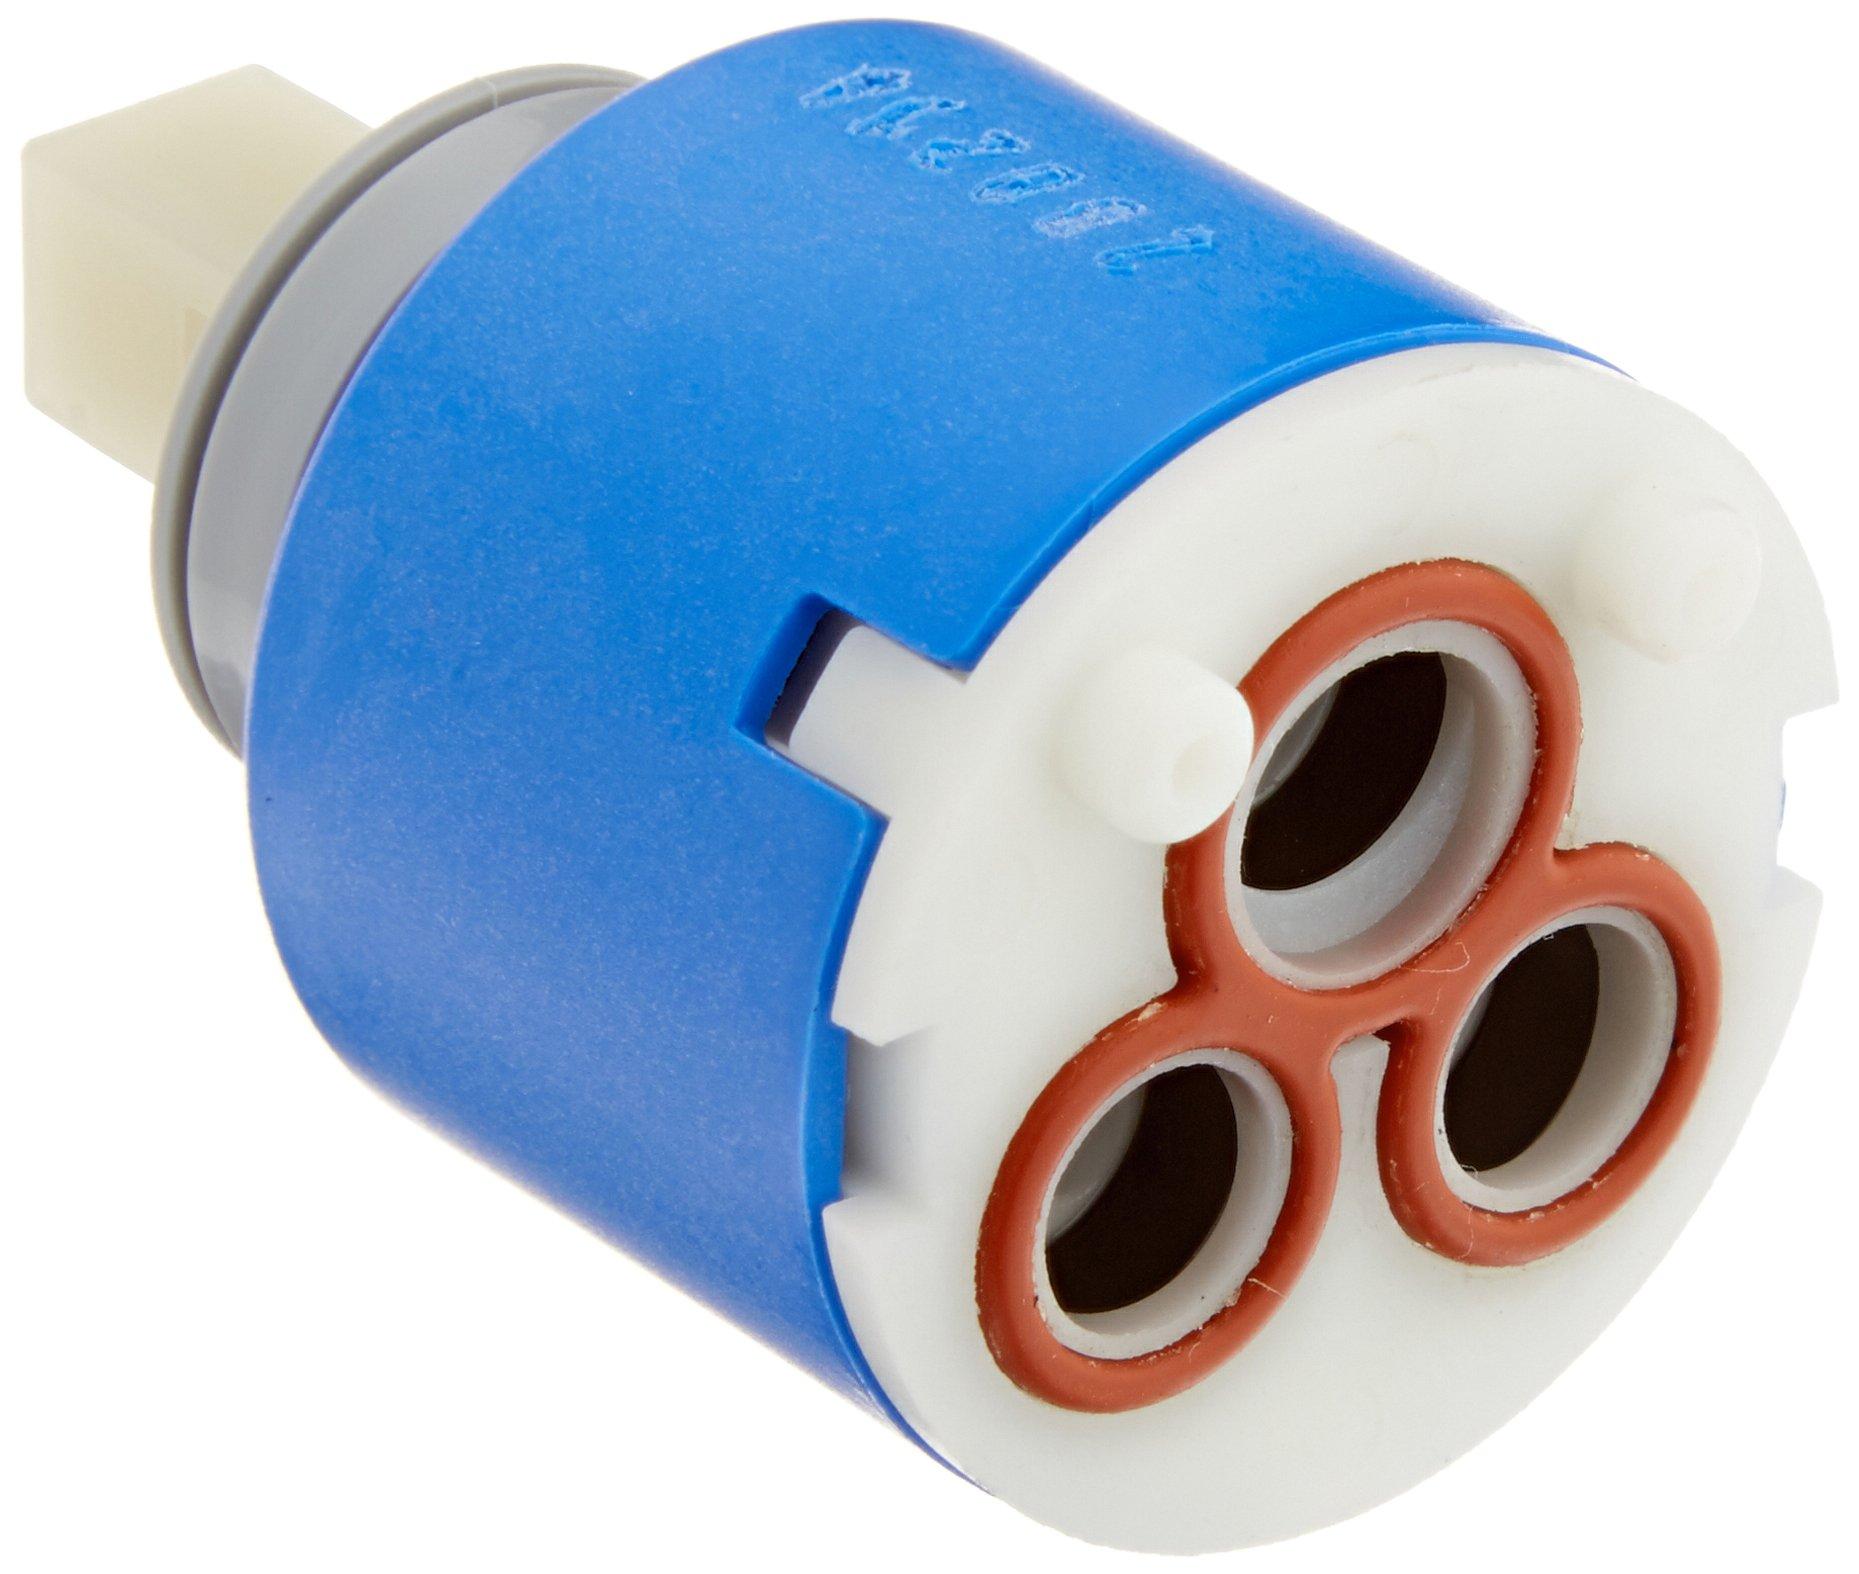 Danze DA507348N Ceramic Disc Cartridge for Single Handle Faucet, 35mm by Danze (Image #2)